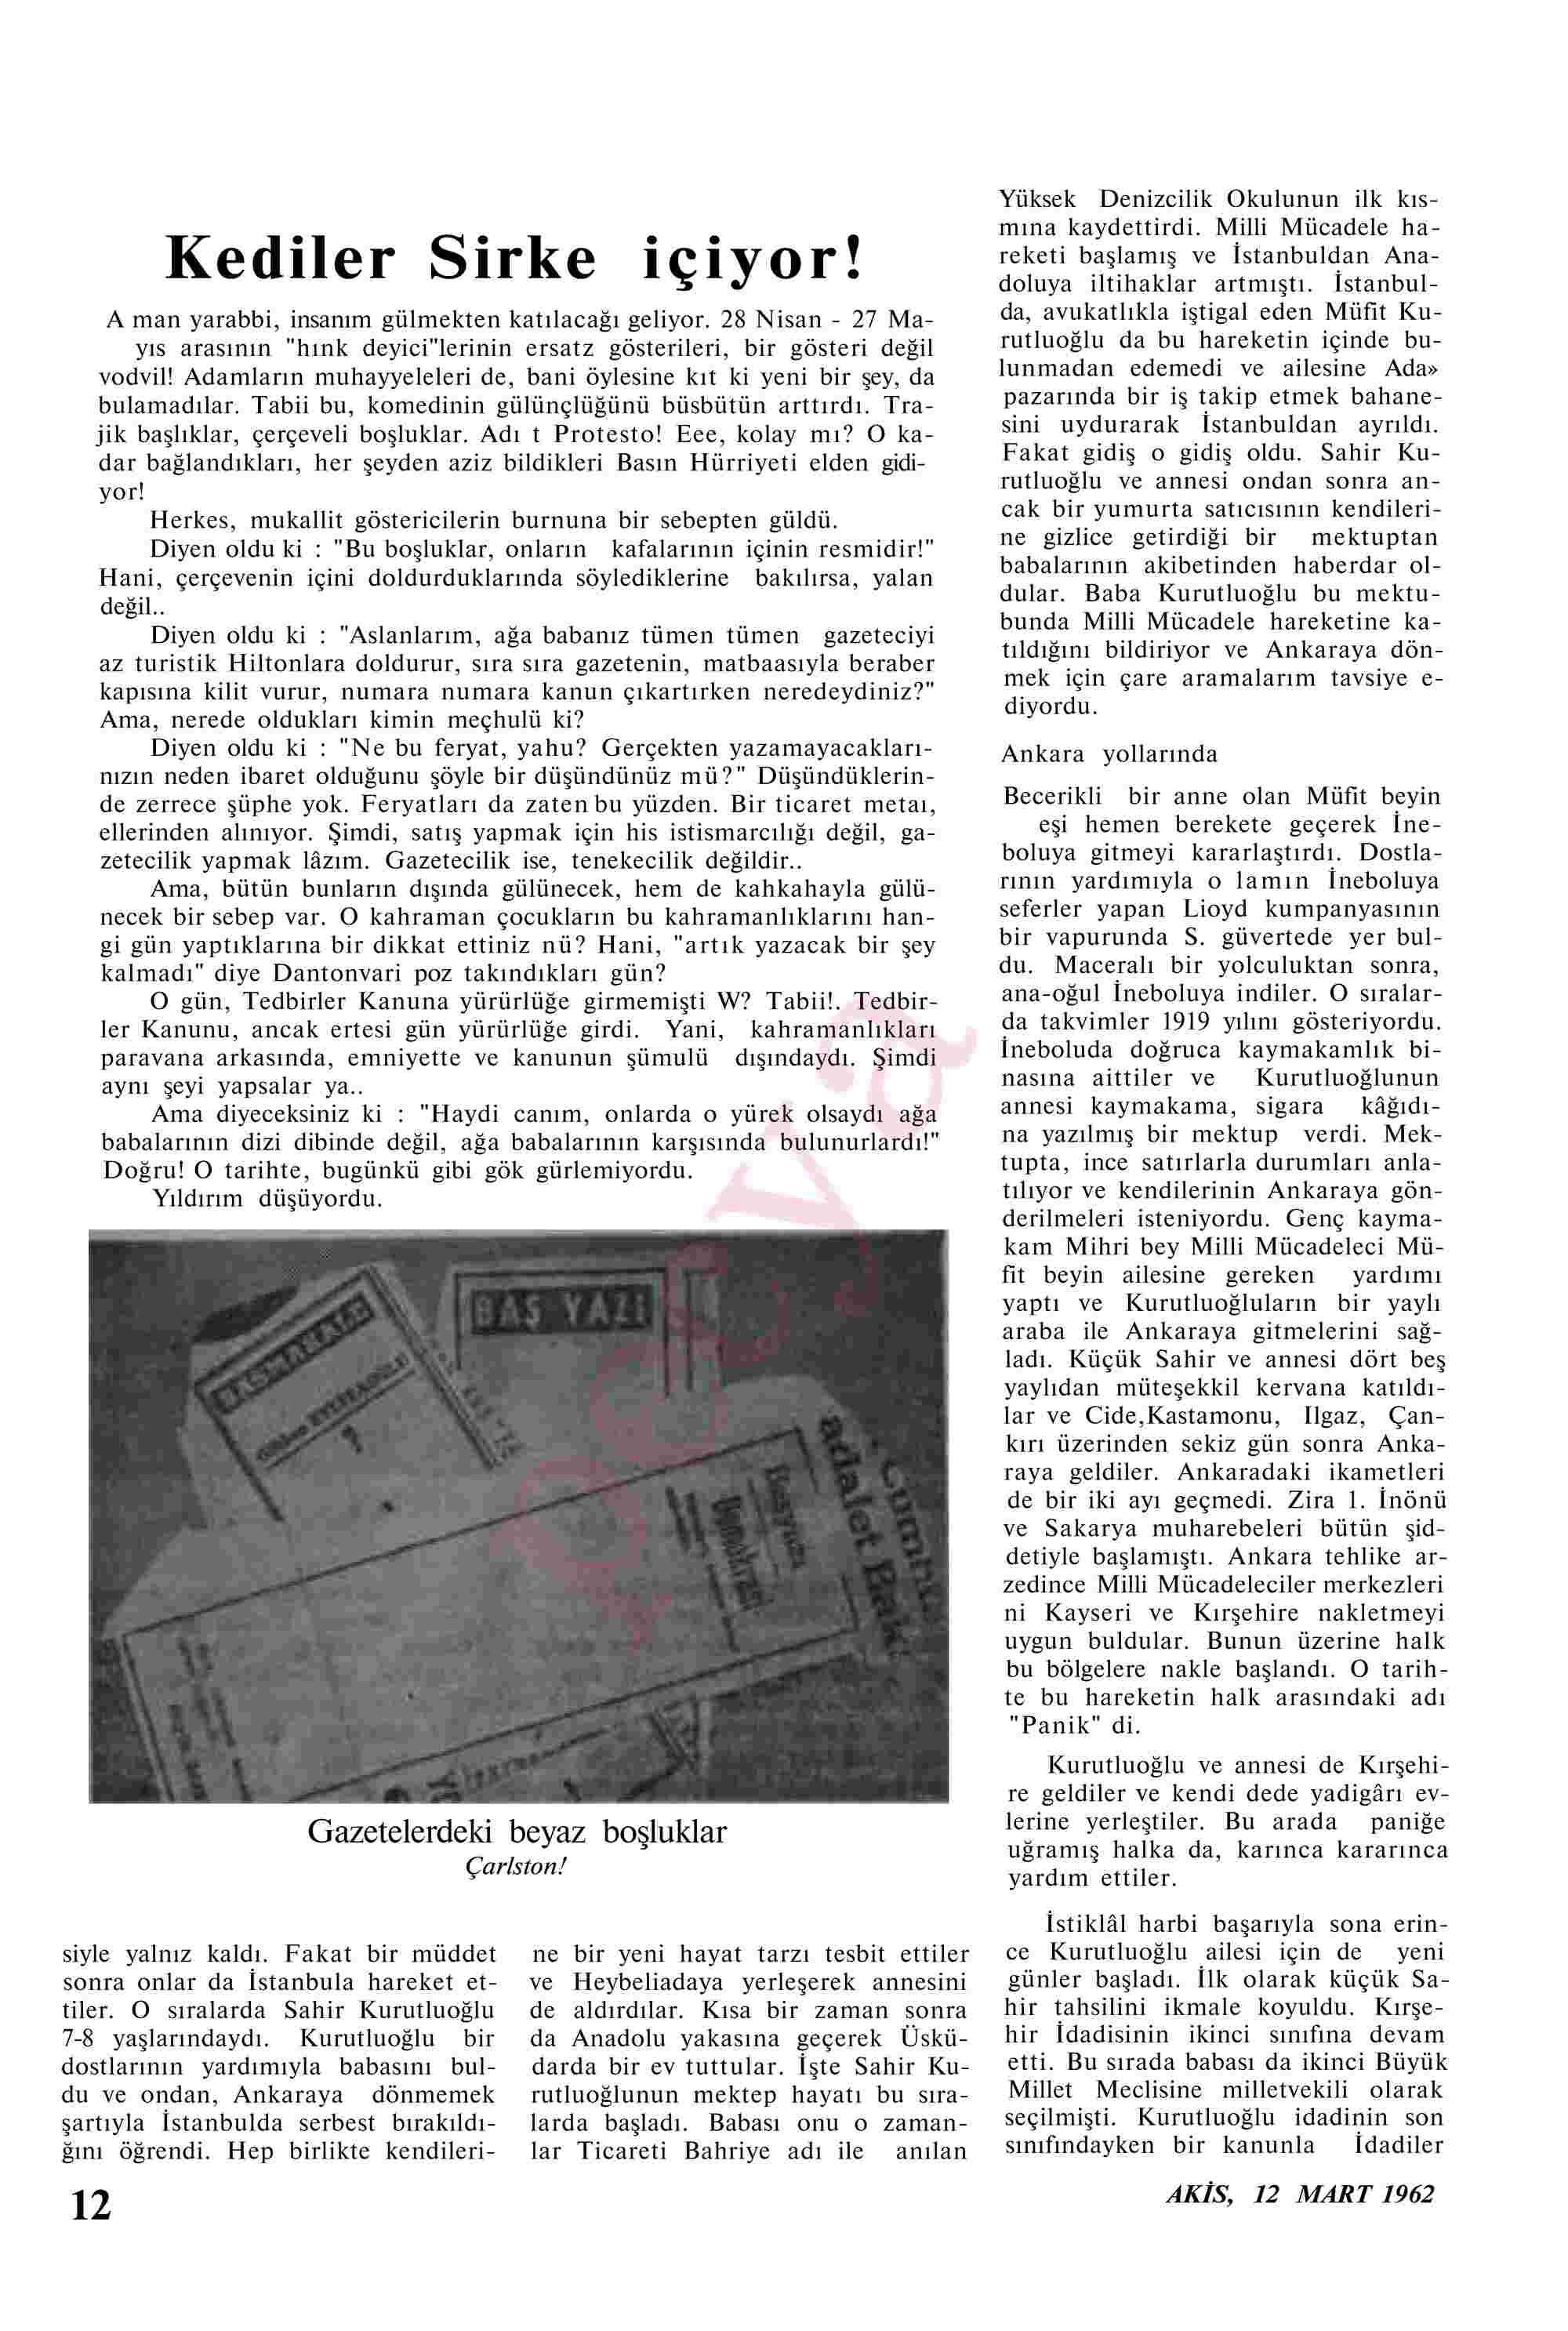 12 Mart 1962 Tarihli Akis Dergisi Sayfa 12